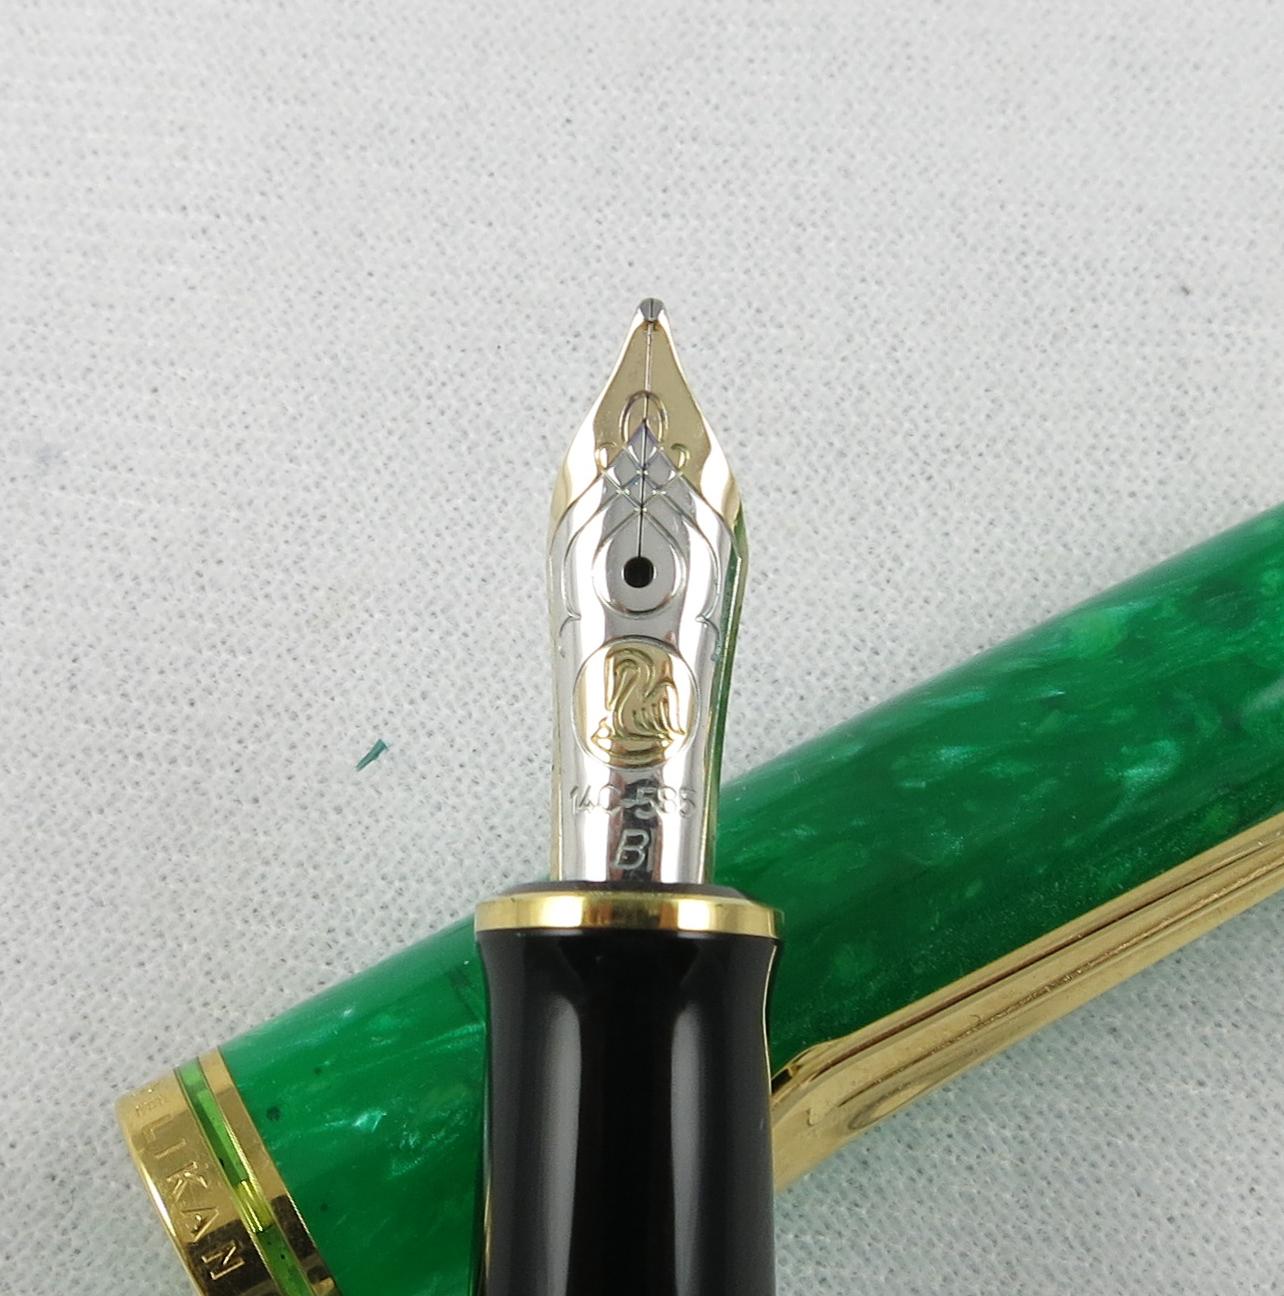 Pelikan Souveran M600 Limited Edition in Vibrant Green (SB595)